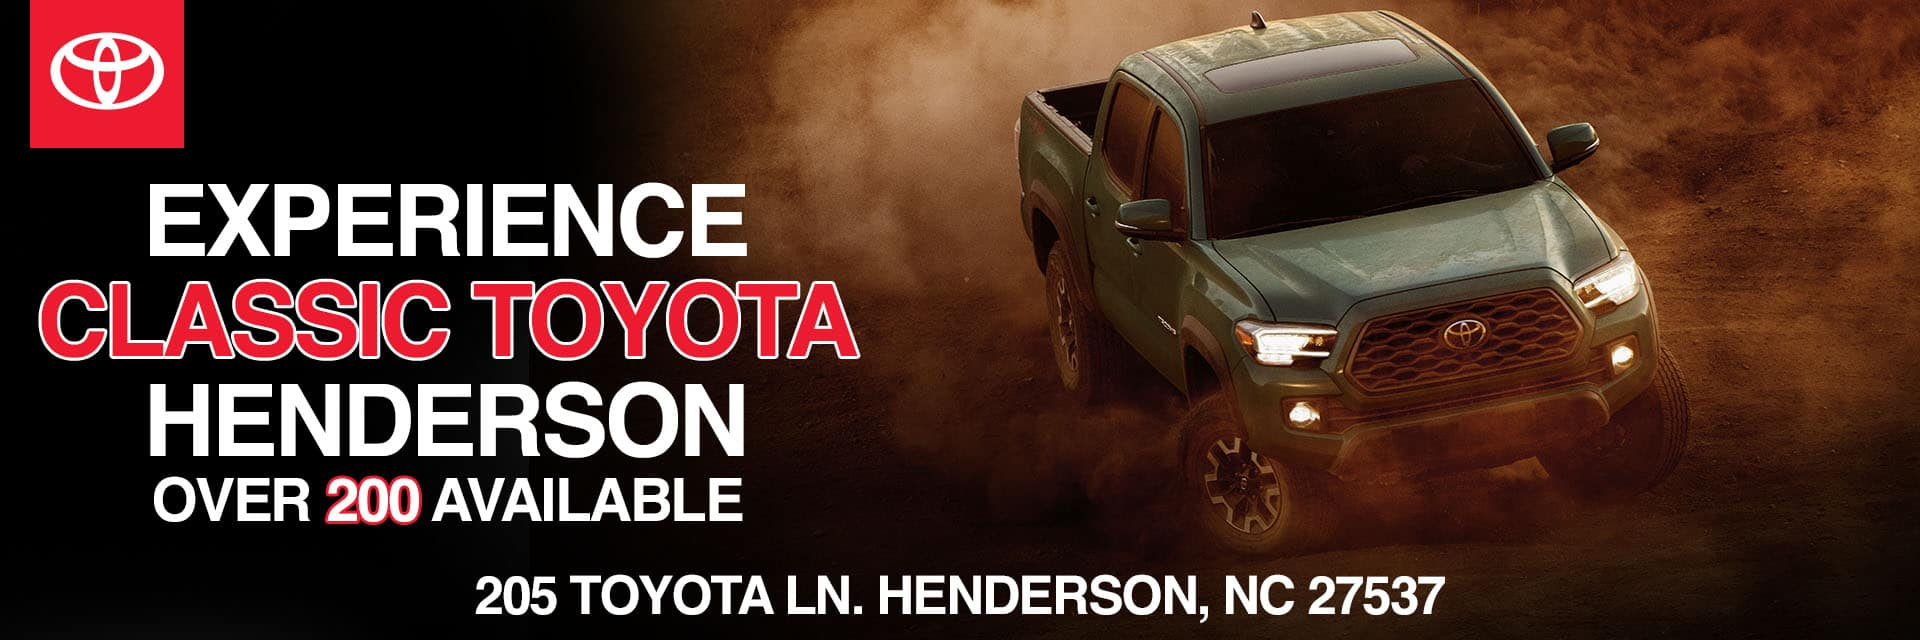 Now Open SliderExperience Classic Toyota Henderson